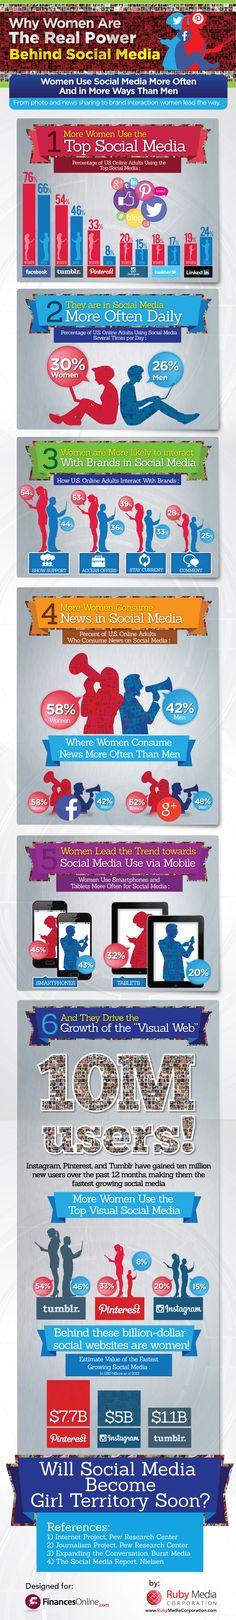 Donne e Social Network: Dati in Infographic